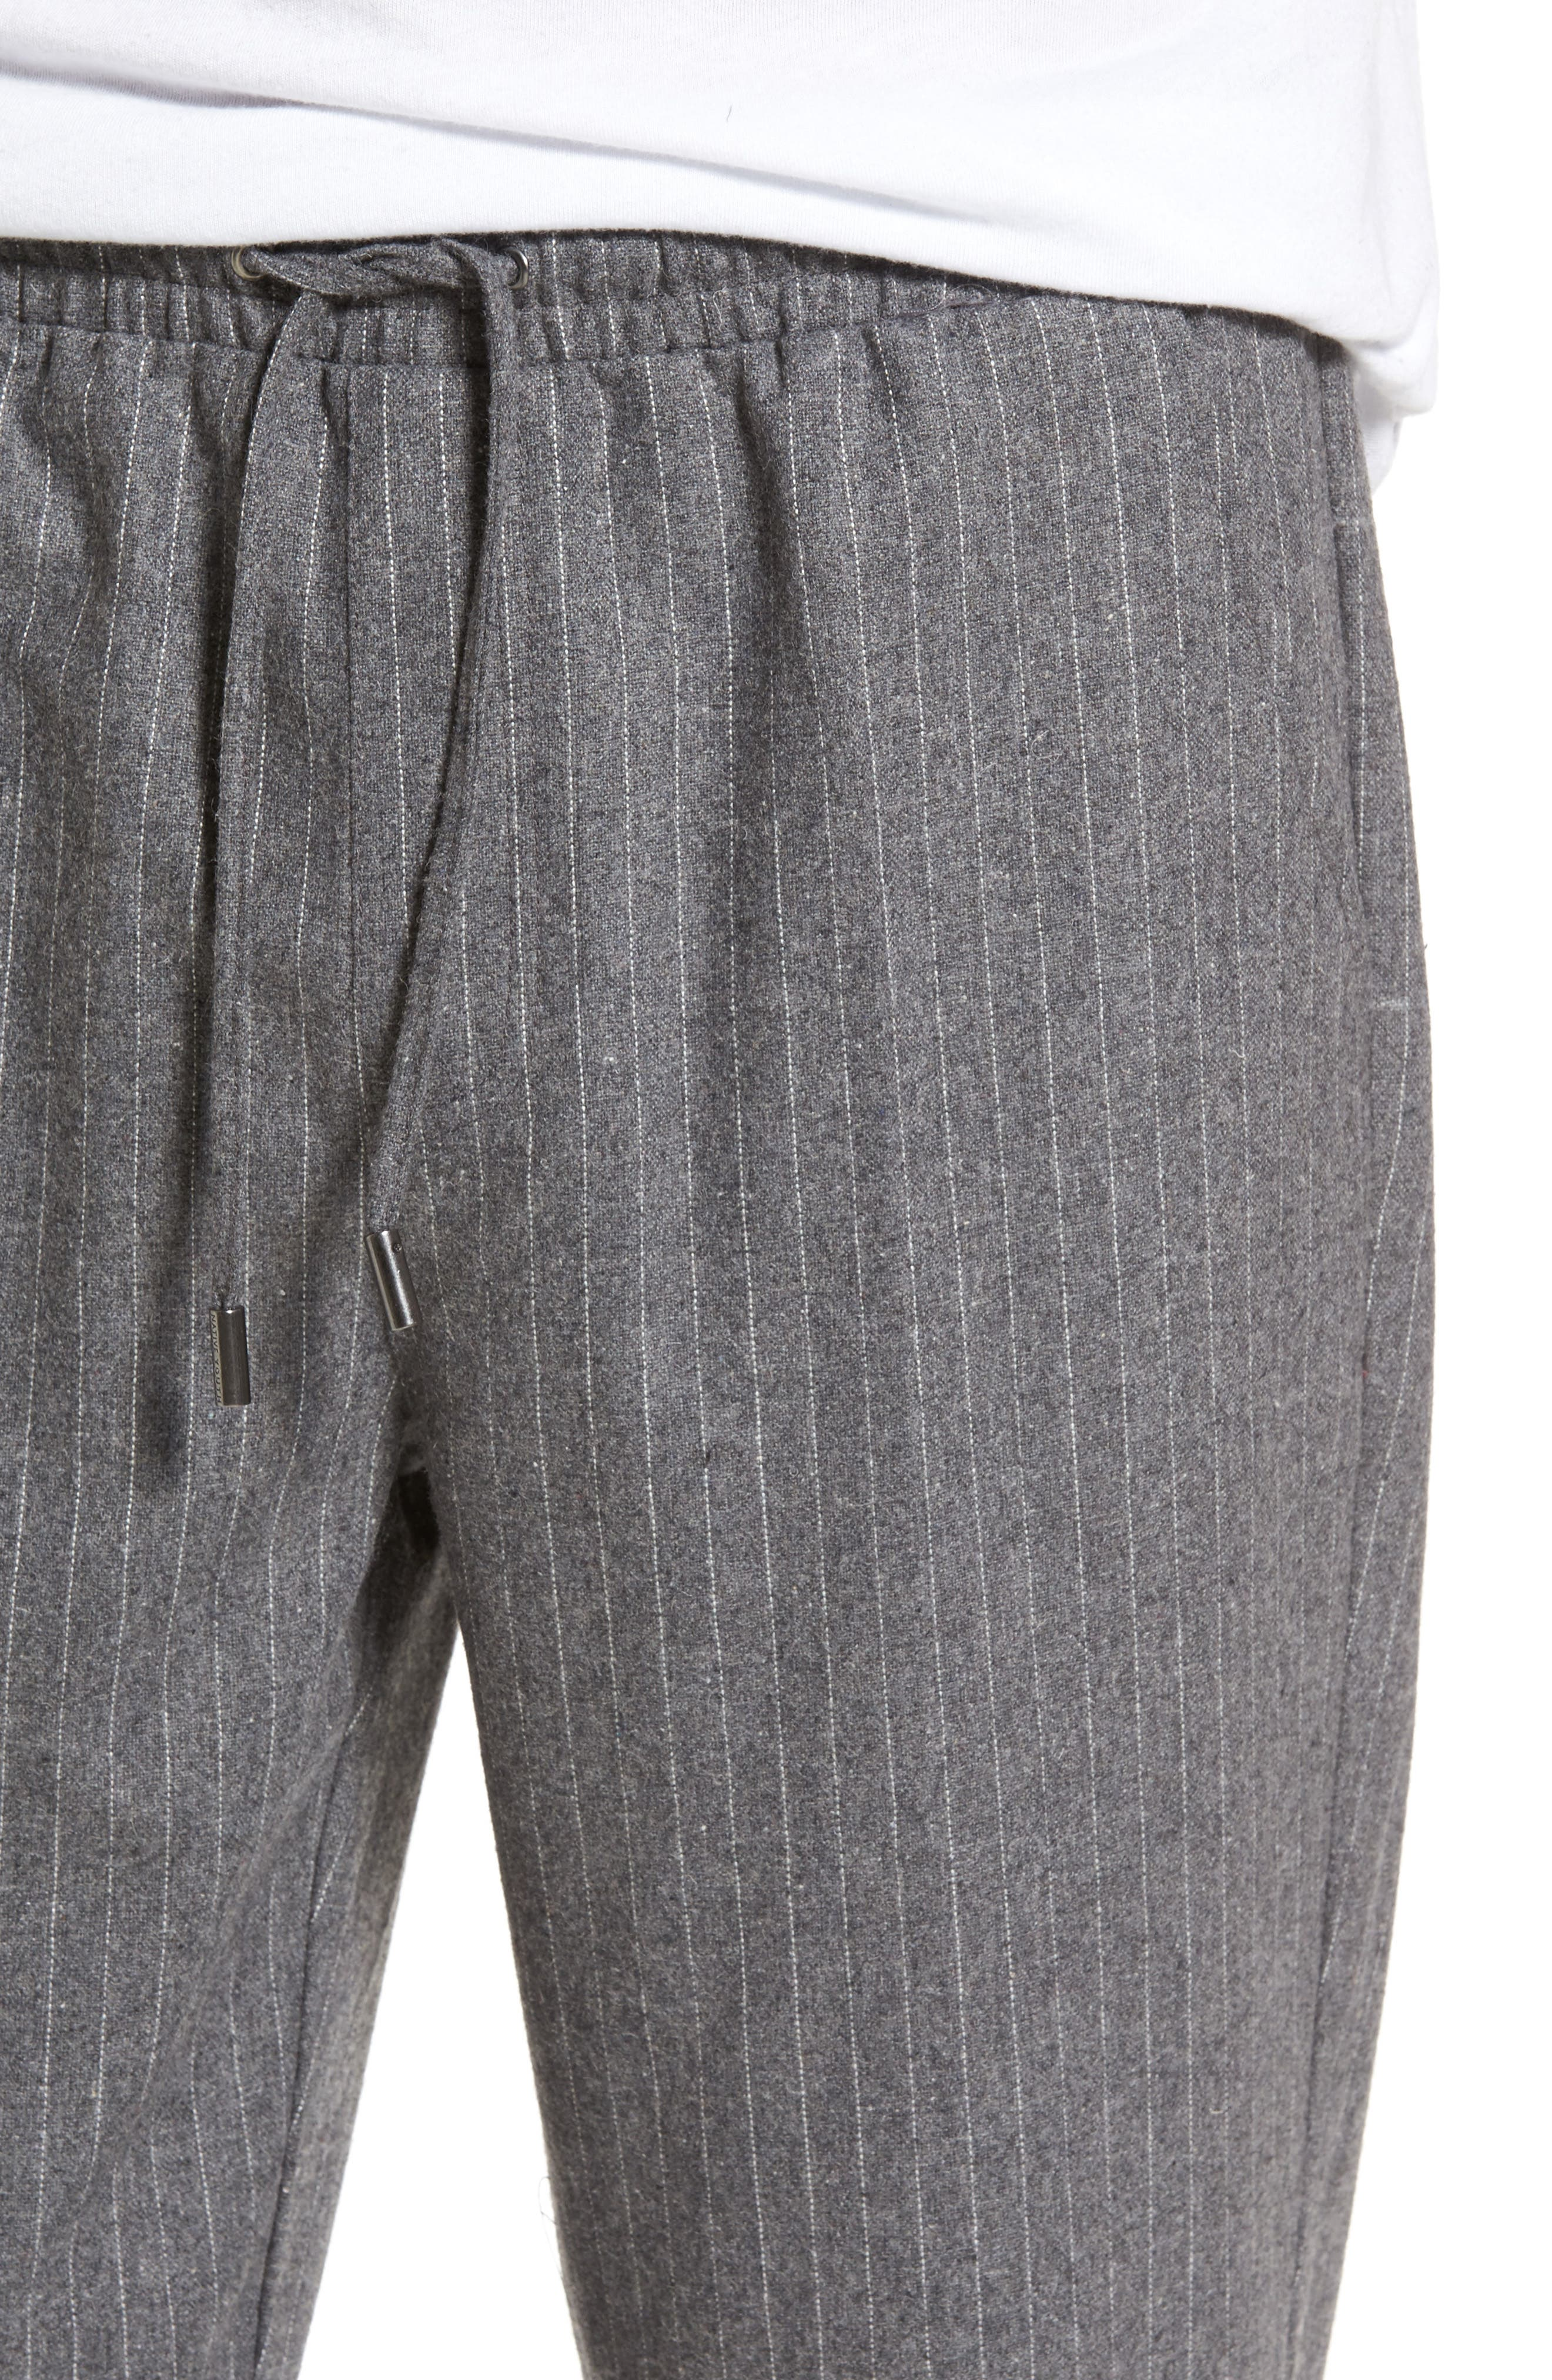 Pennyworth Pants,                             Alternate thumbnail 4, color,                             Charcoal Pinstripe